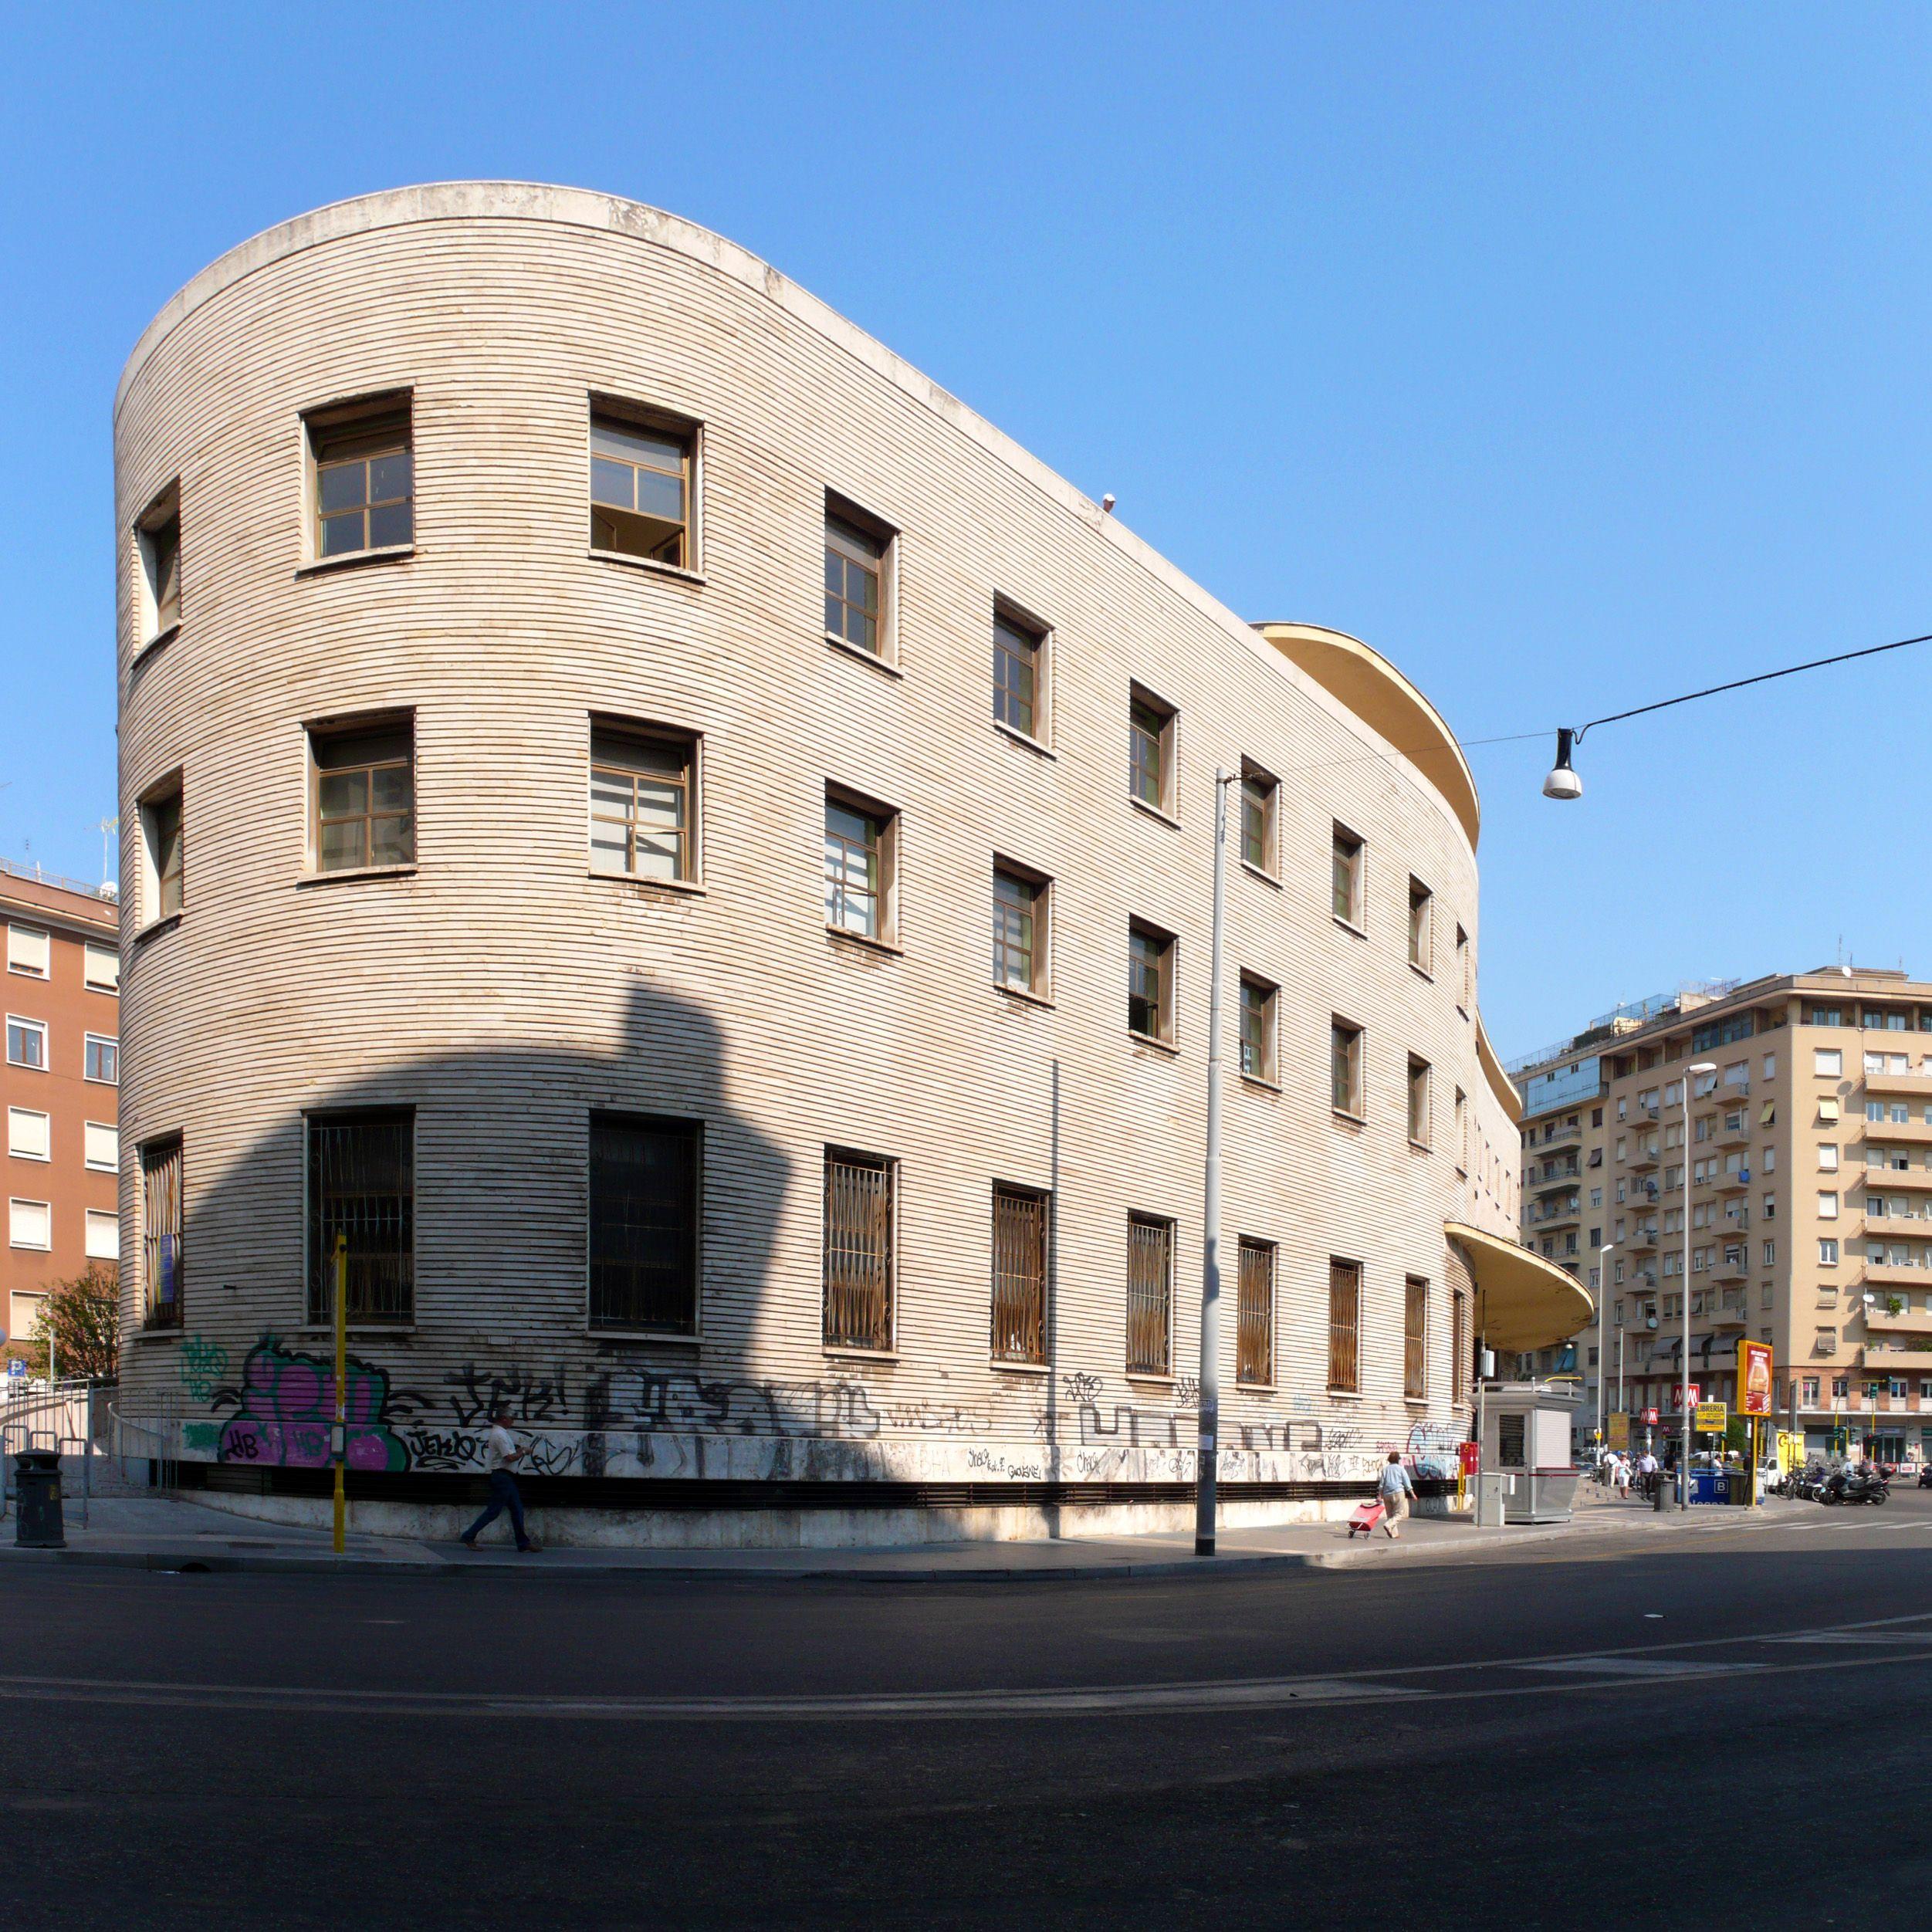 IT Roma Post Office Piazza Bologna Architects Mario